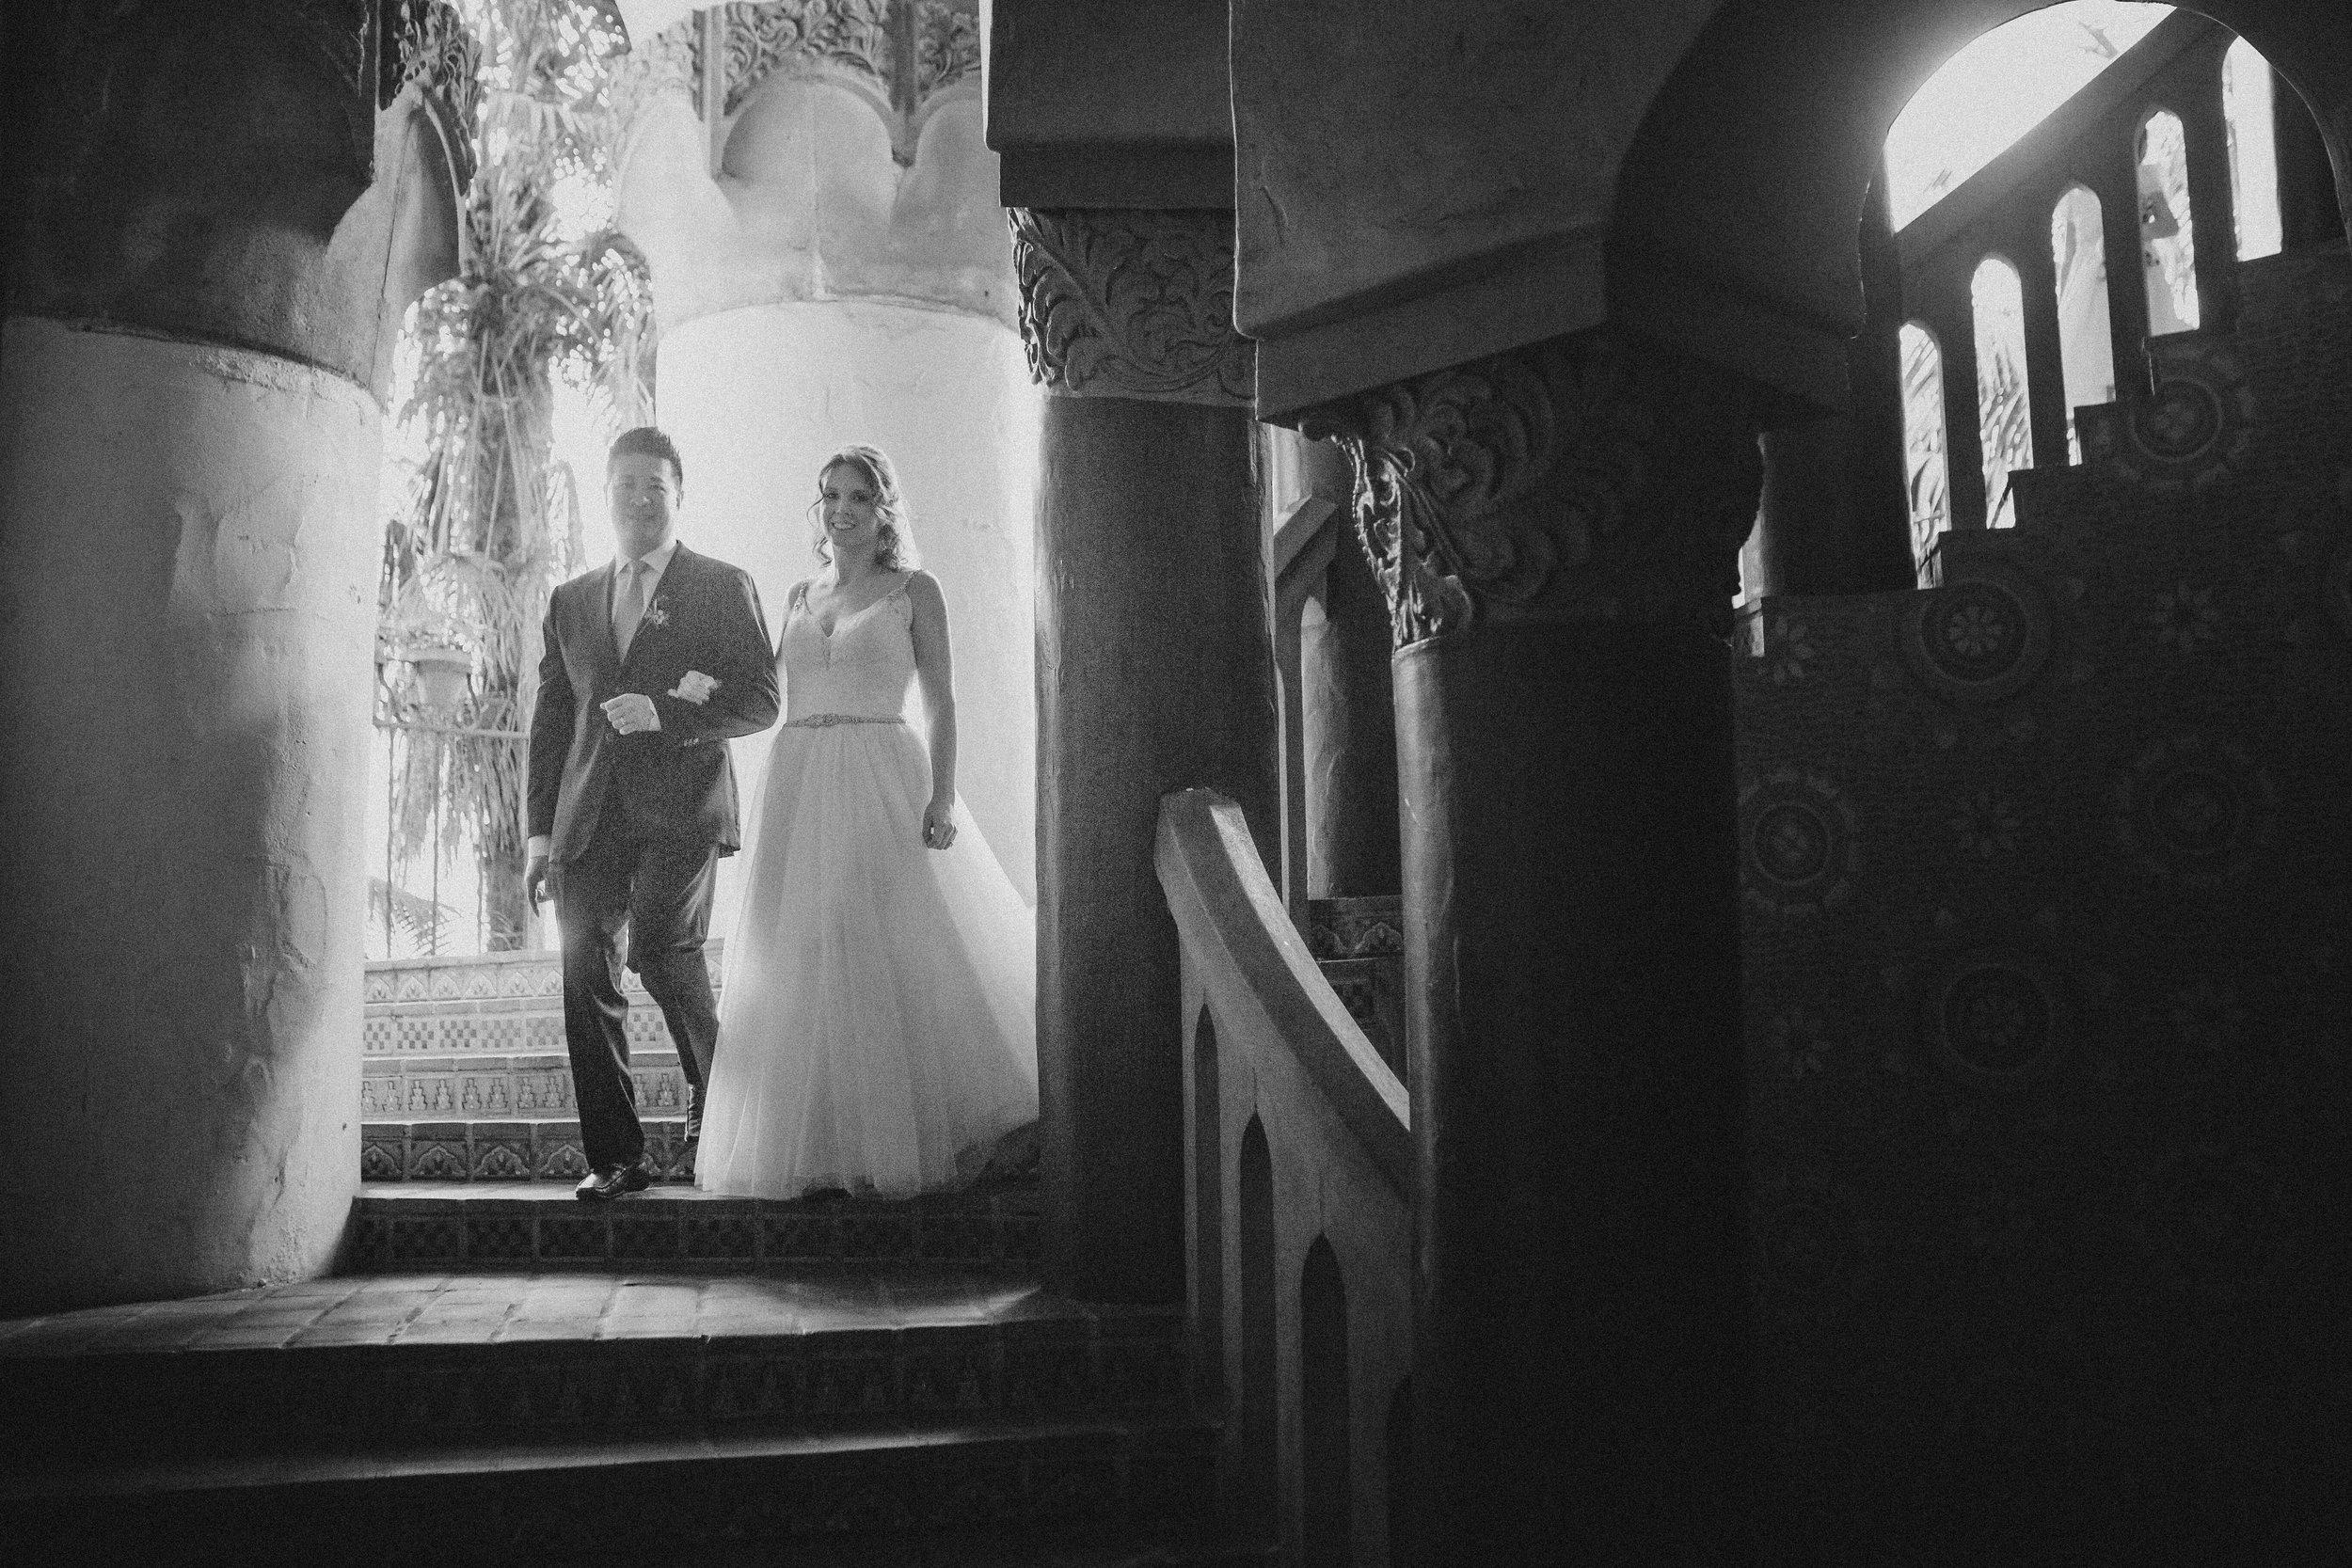 www.santabarbawedding.com | Venue: Santa Barbara Courthouse | Photography: Ryanne Bee Photography | Officiant: Santa Barbara Classic Weddings | Bride and Groom in Venue